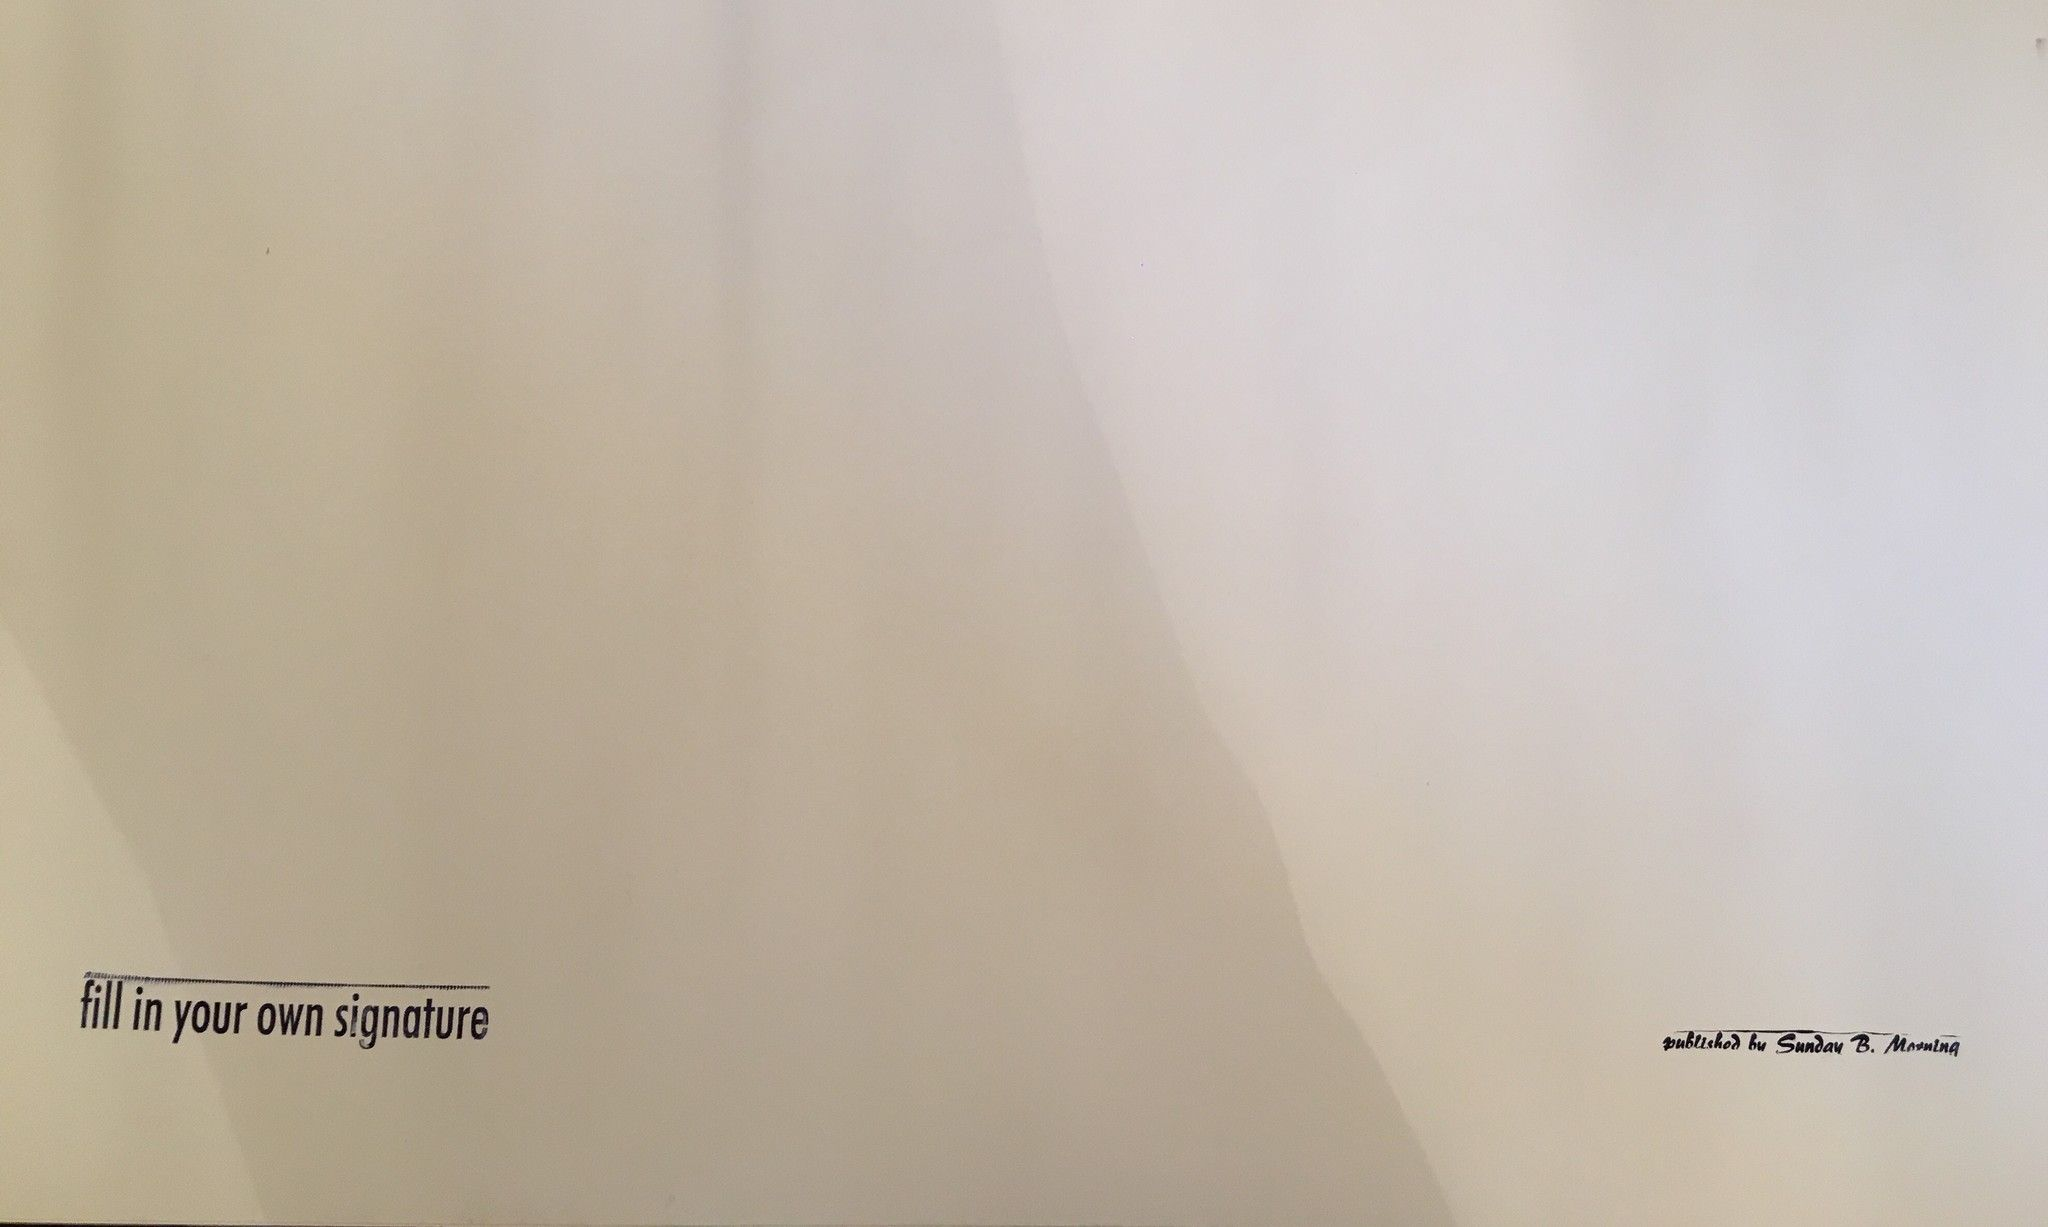 SERIGRAFIA ANDY WARHOL ' MARILYN 5 '  dimensioni L 91,5 x H 91,5 cm.